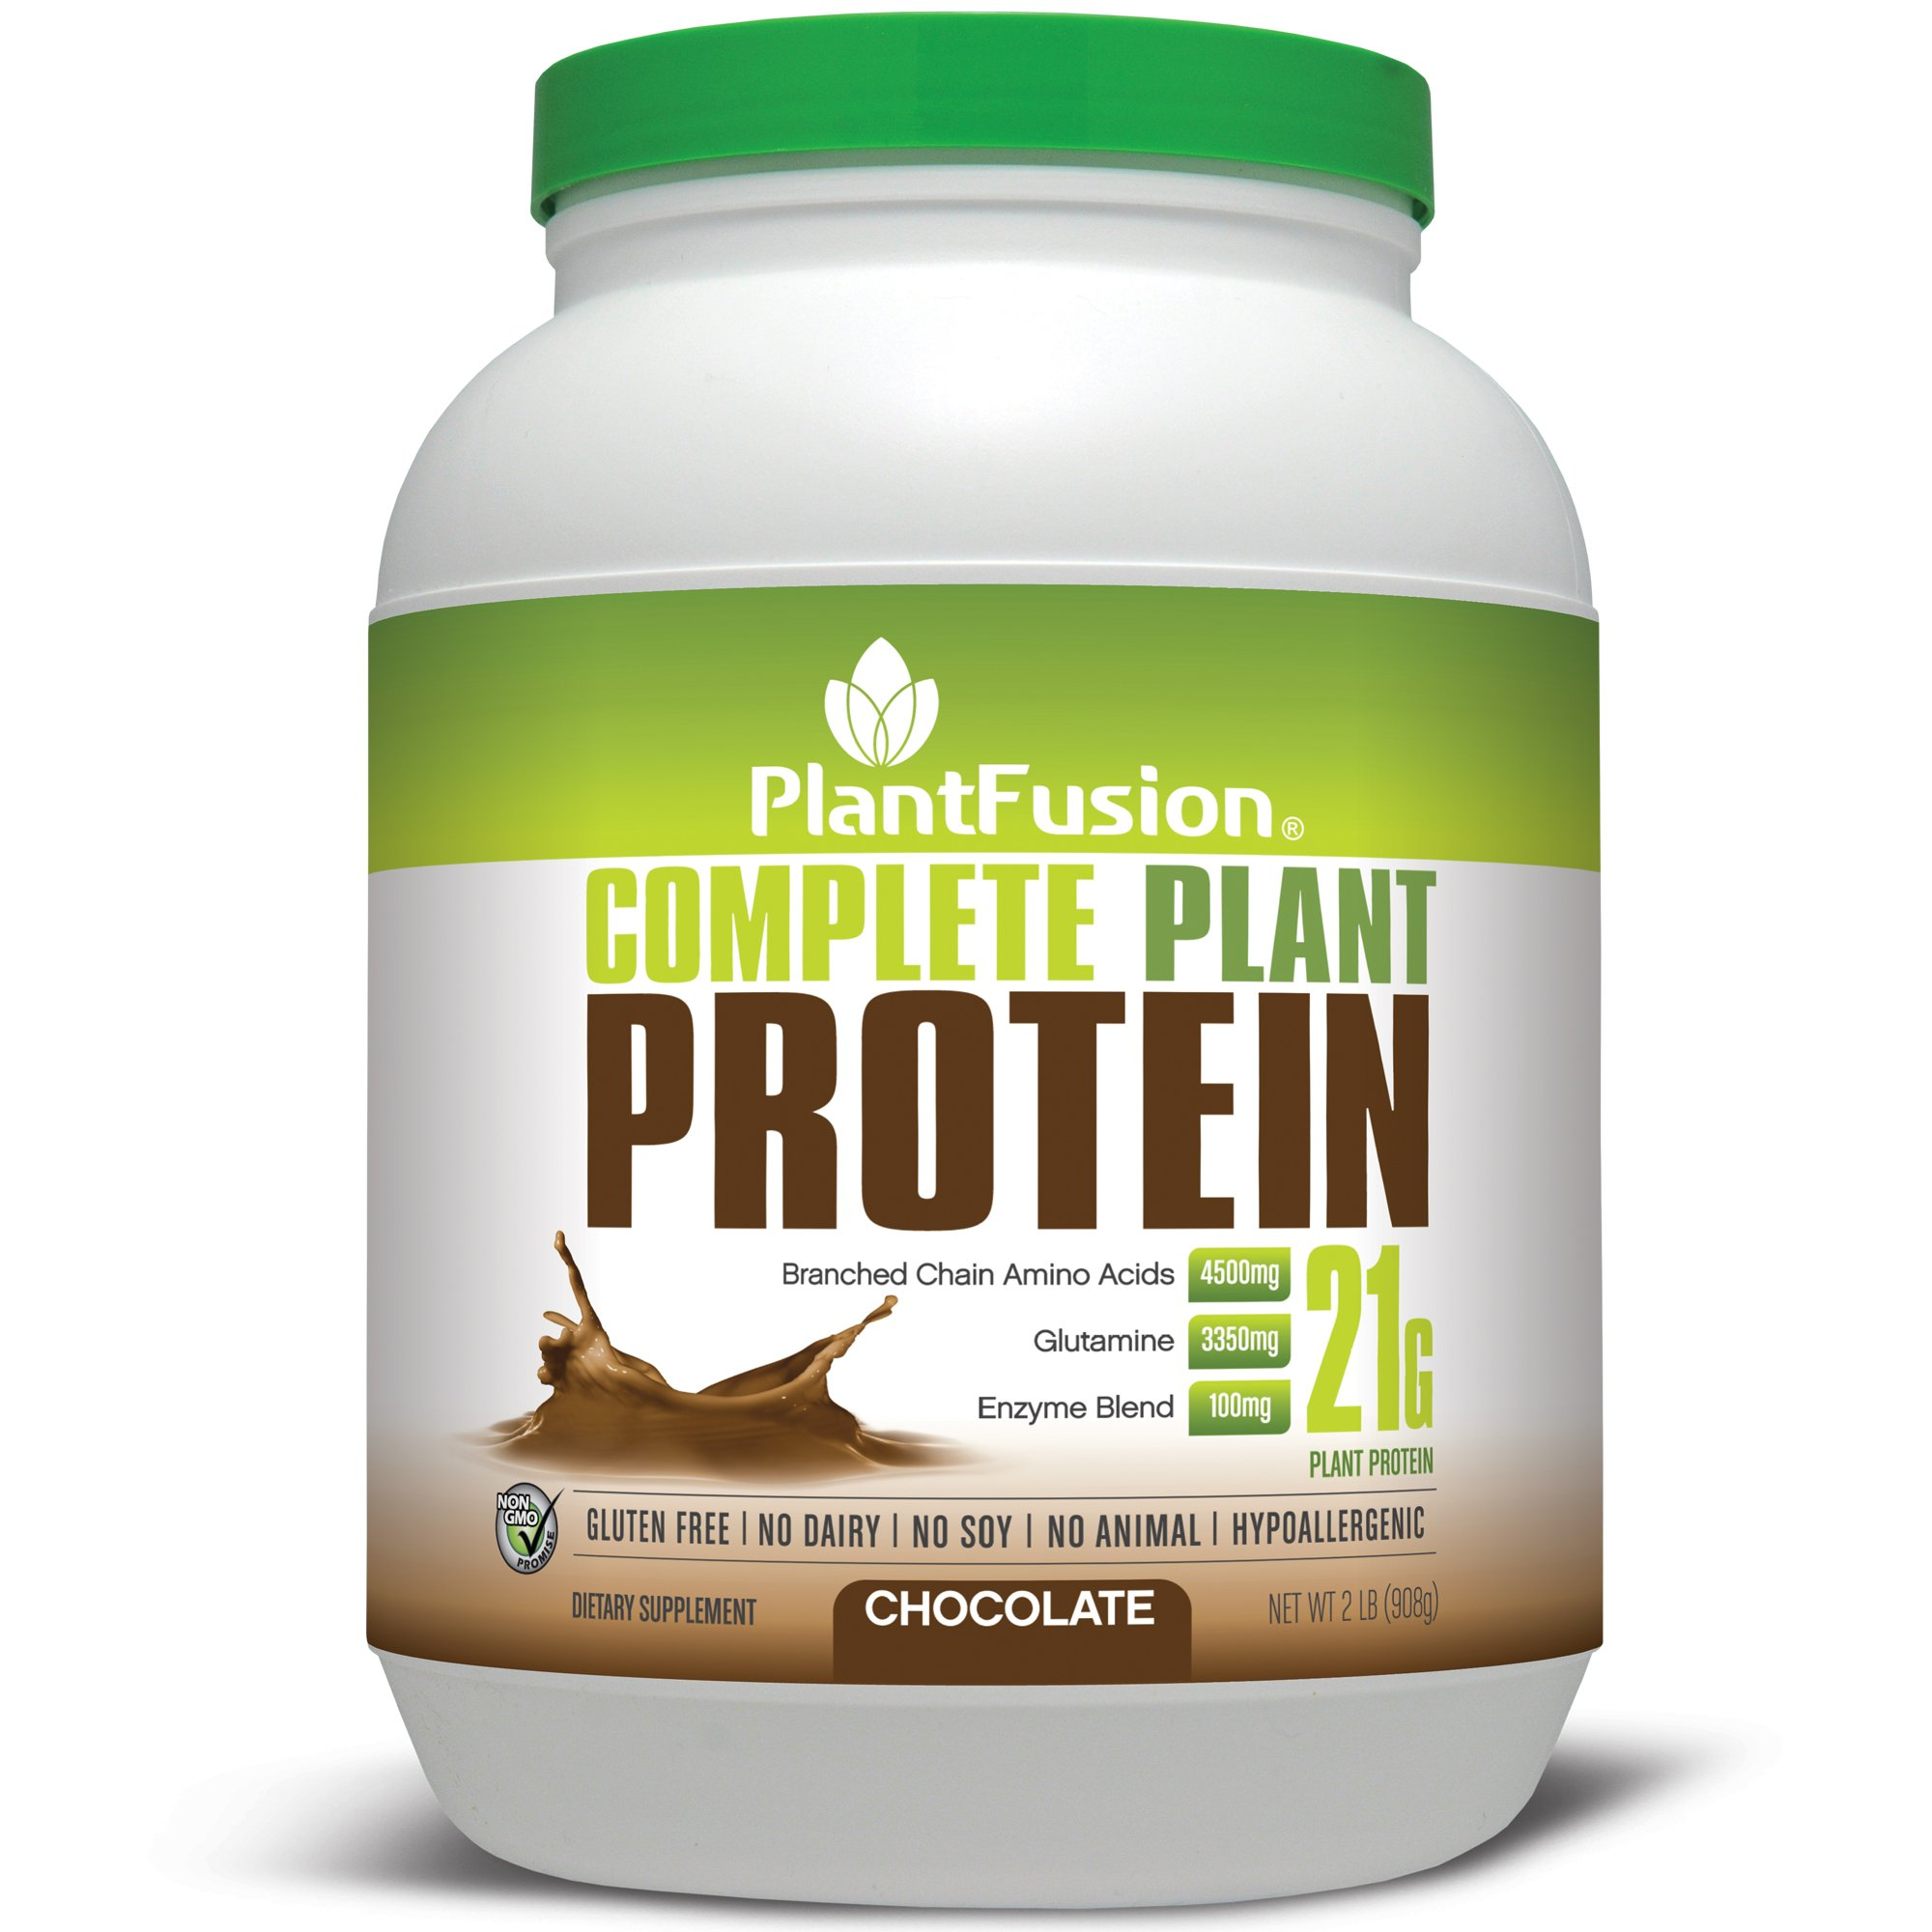 Amazon.com: PlantFusion Complete Plant Based Protein Powder, Vanilla Bean, 2 Lb Tub, 30 Servings